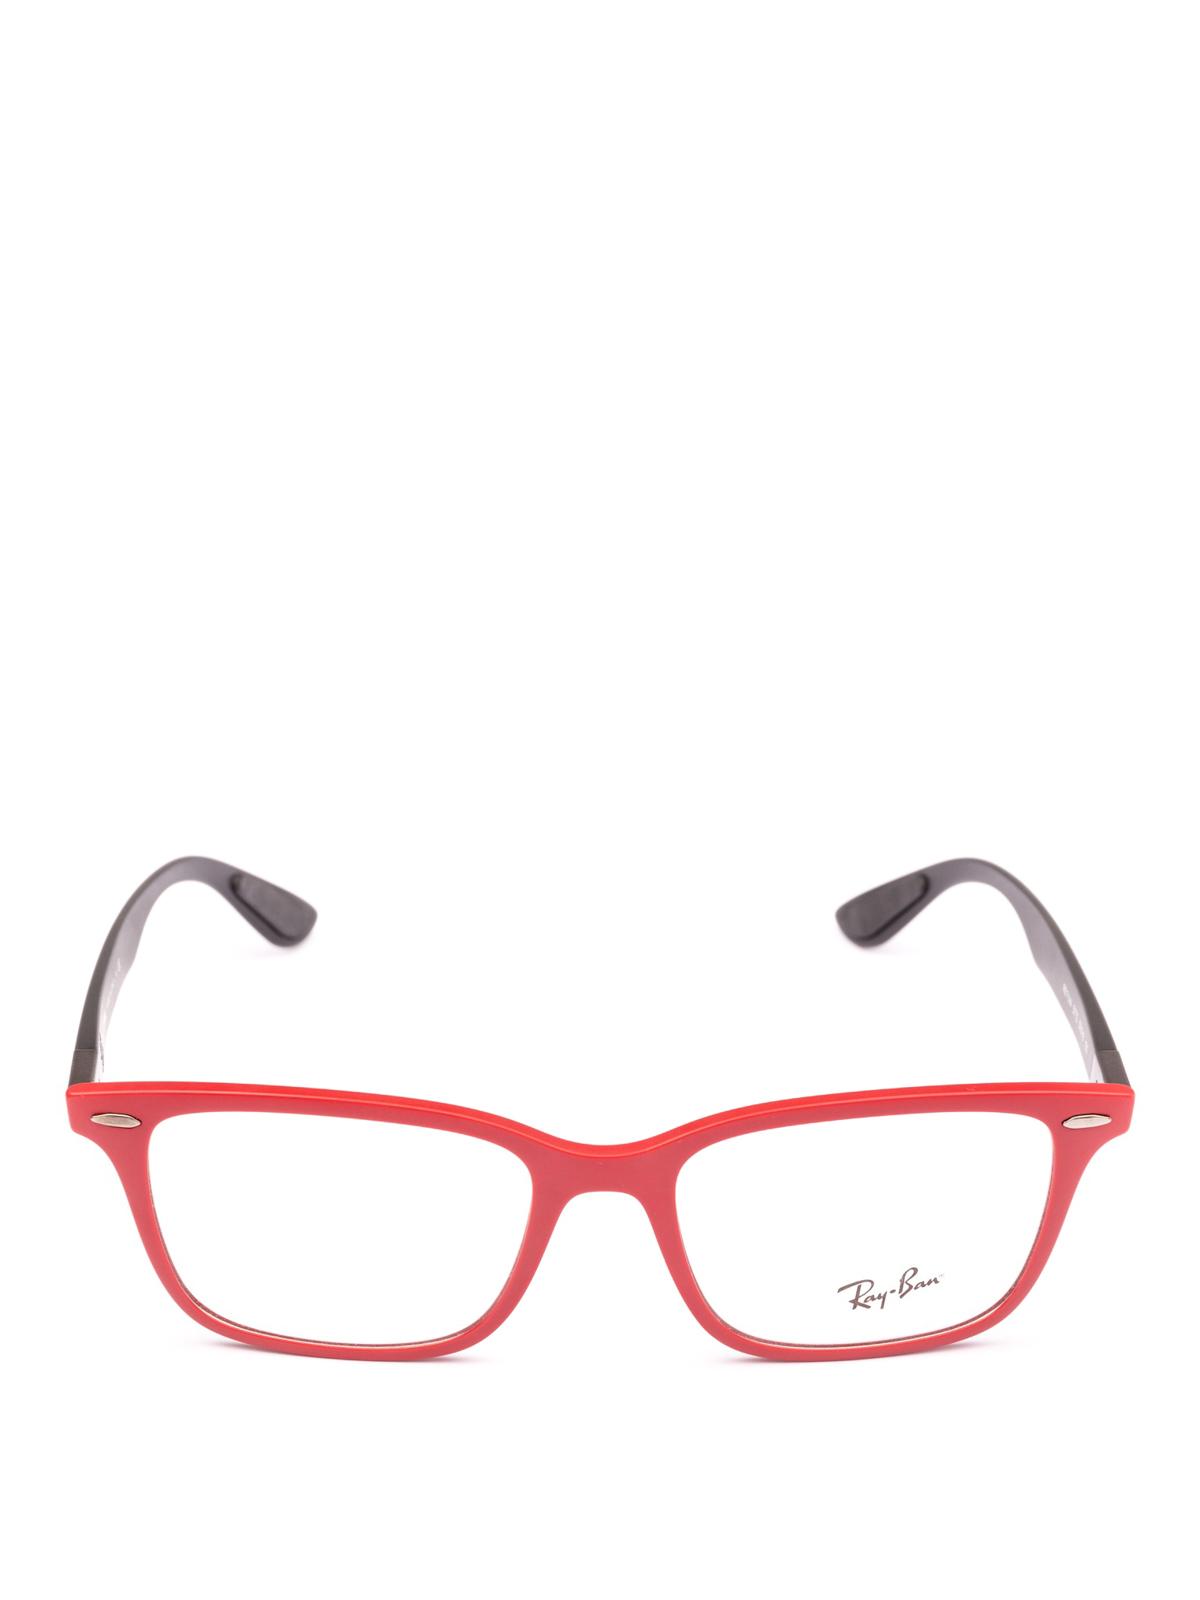 Ray Ban - Red and black frame rectangular glasses - glasses - RB7144 ...